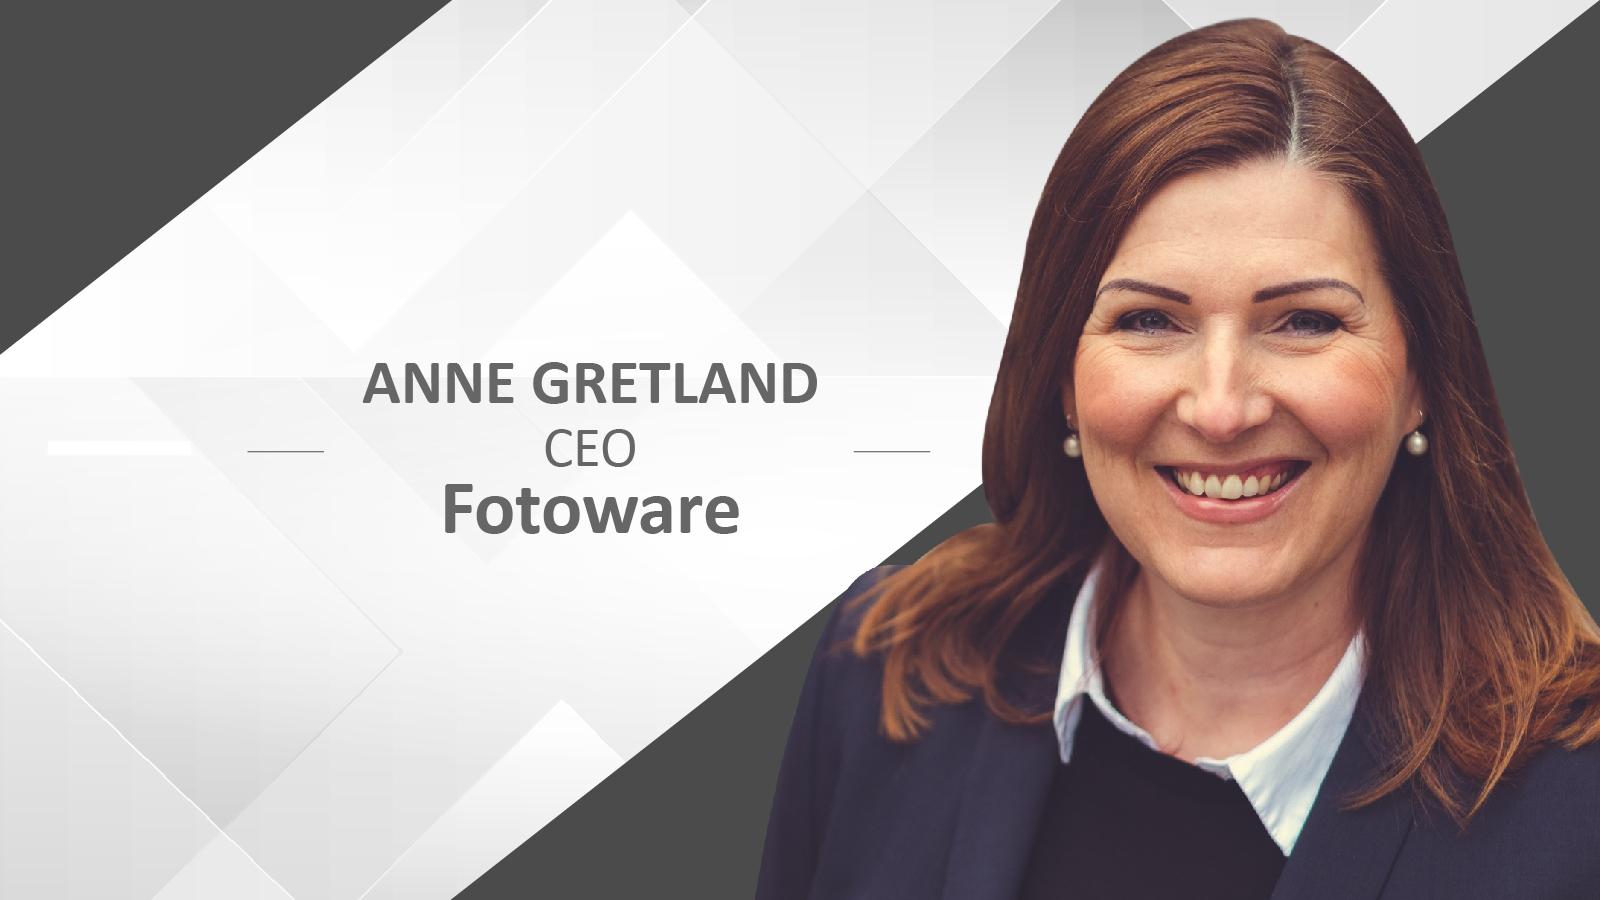 ANNE GRETLAND-01